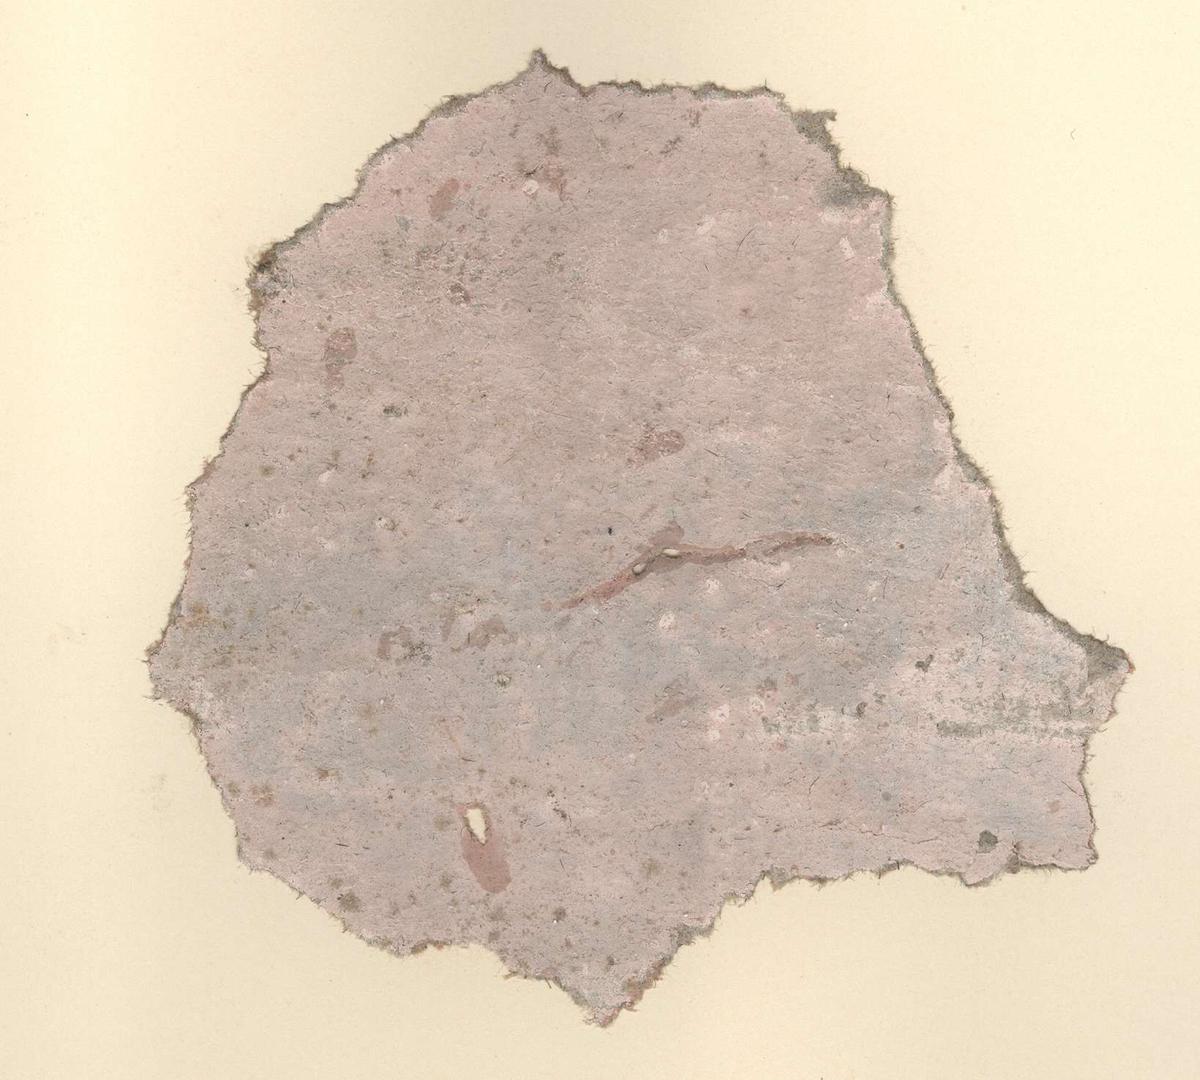 Fragment av tapet av papper, målat, marmorering i ljusrosa.